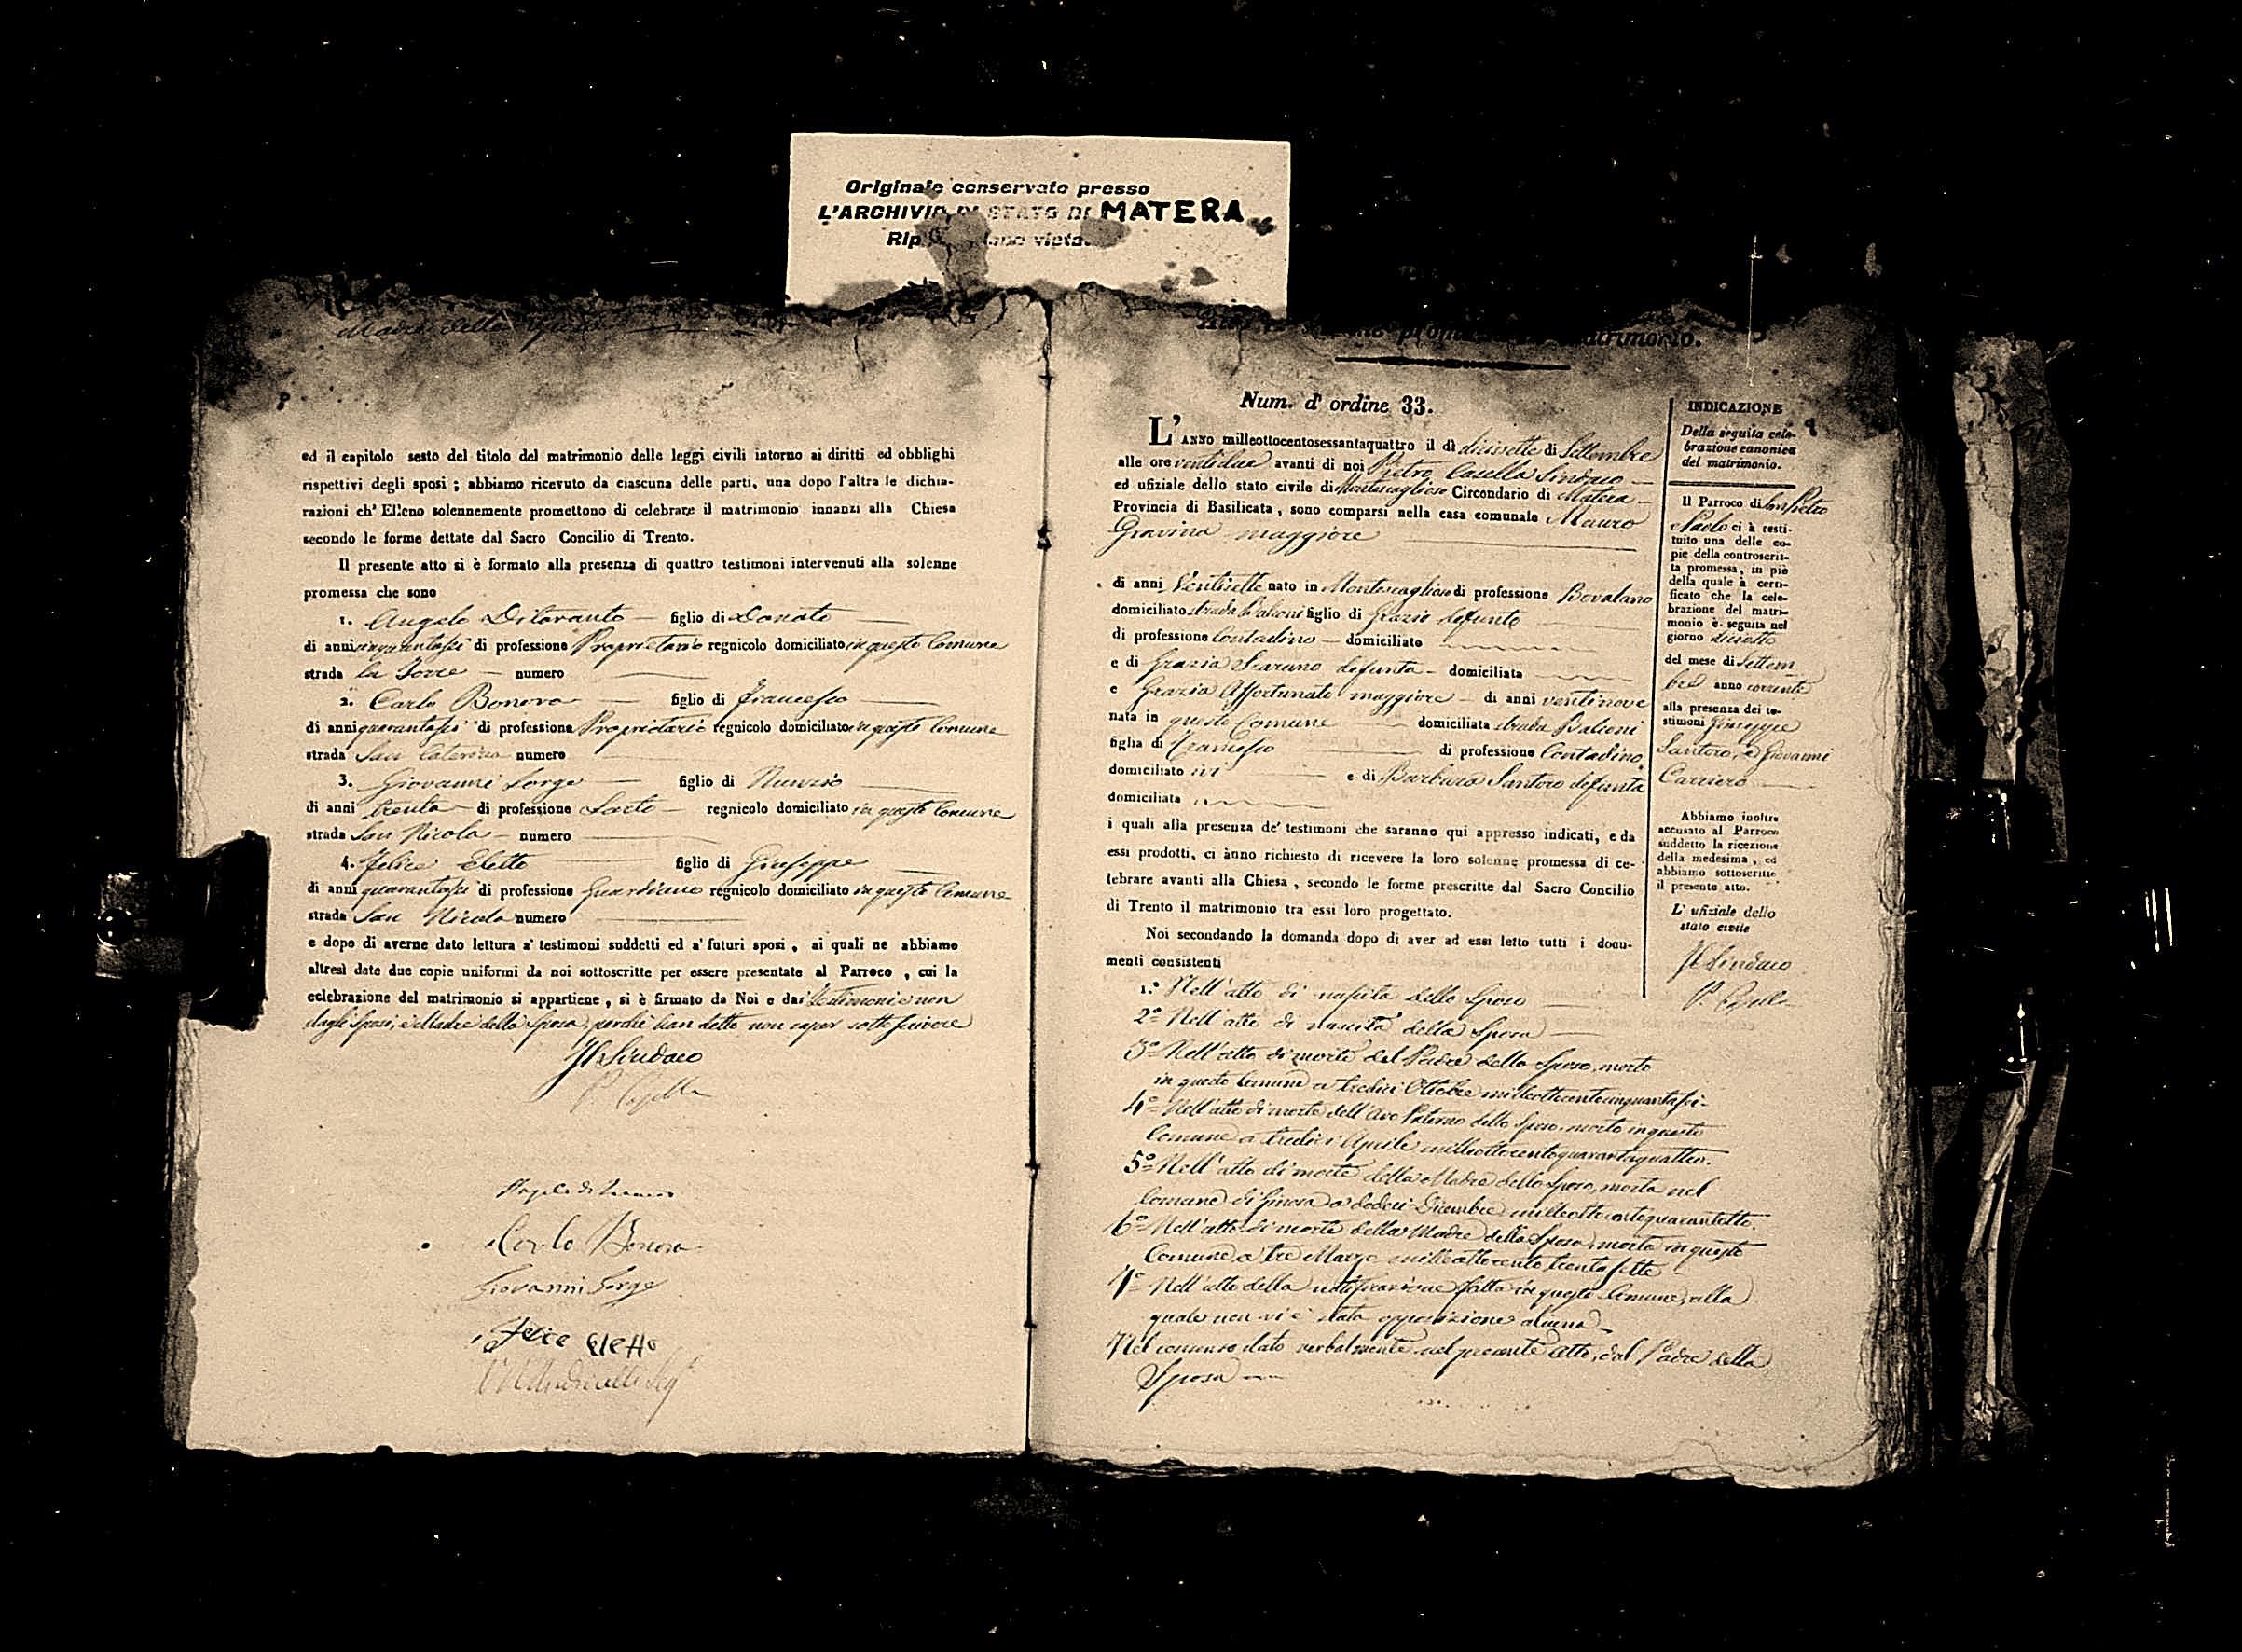 C:\Users\USER\Google Drive\[ - Família Taranto - ]\Docs\Ordem\09 - Certidão de Casamento de Vita Andriulli.2.jpg